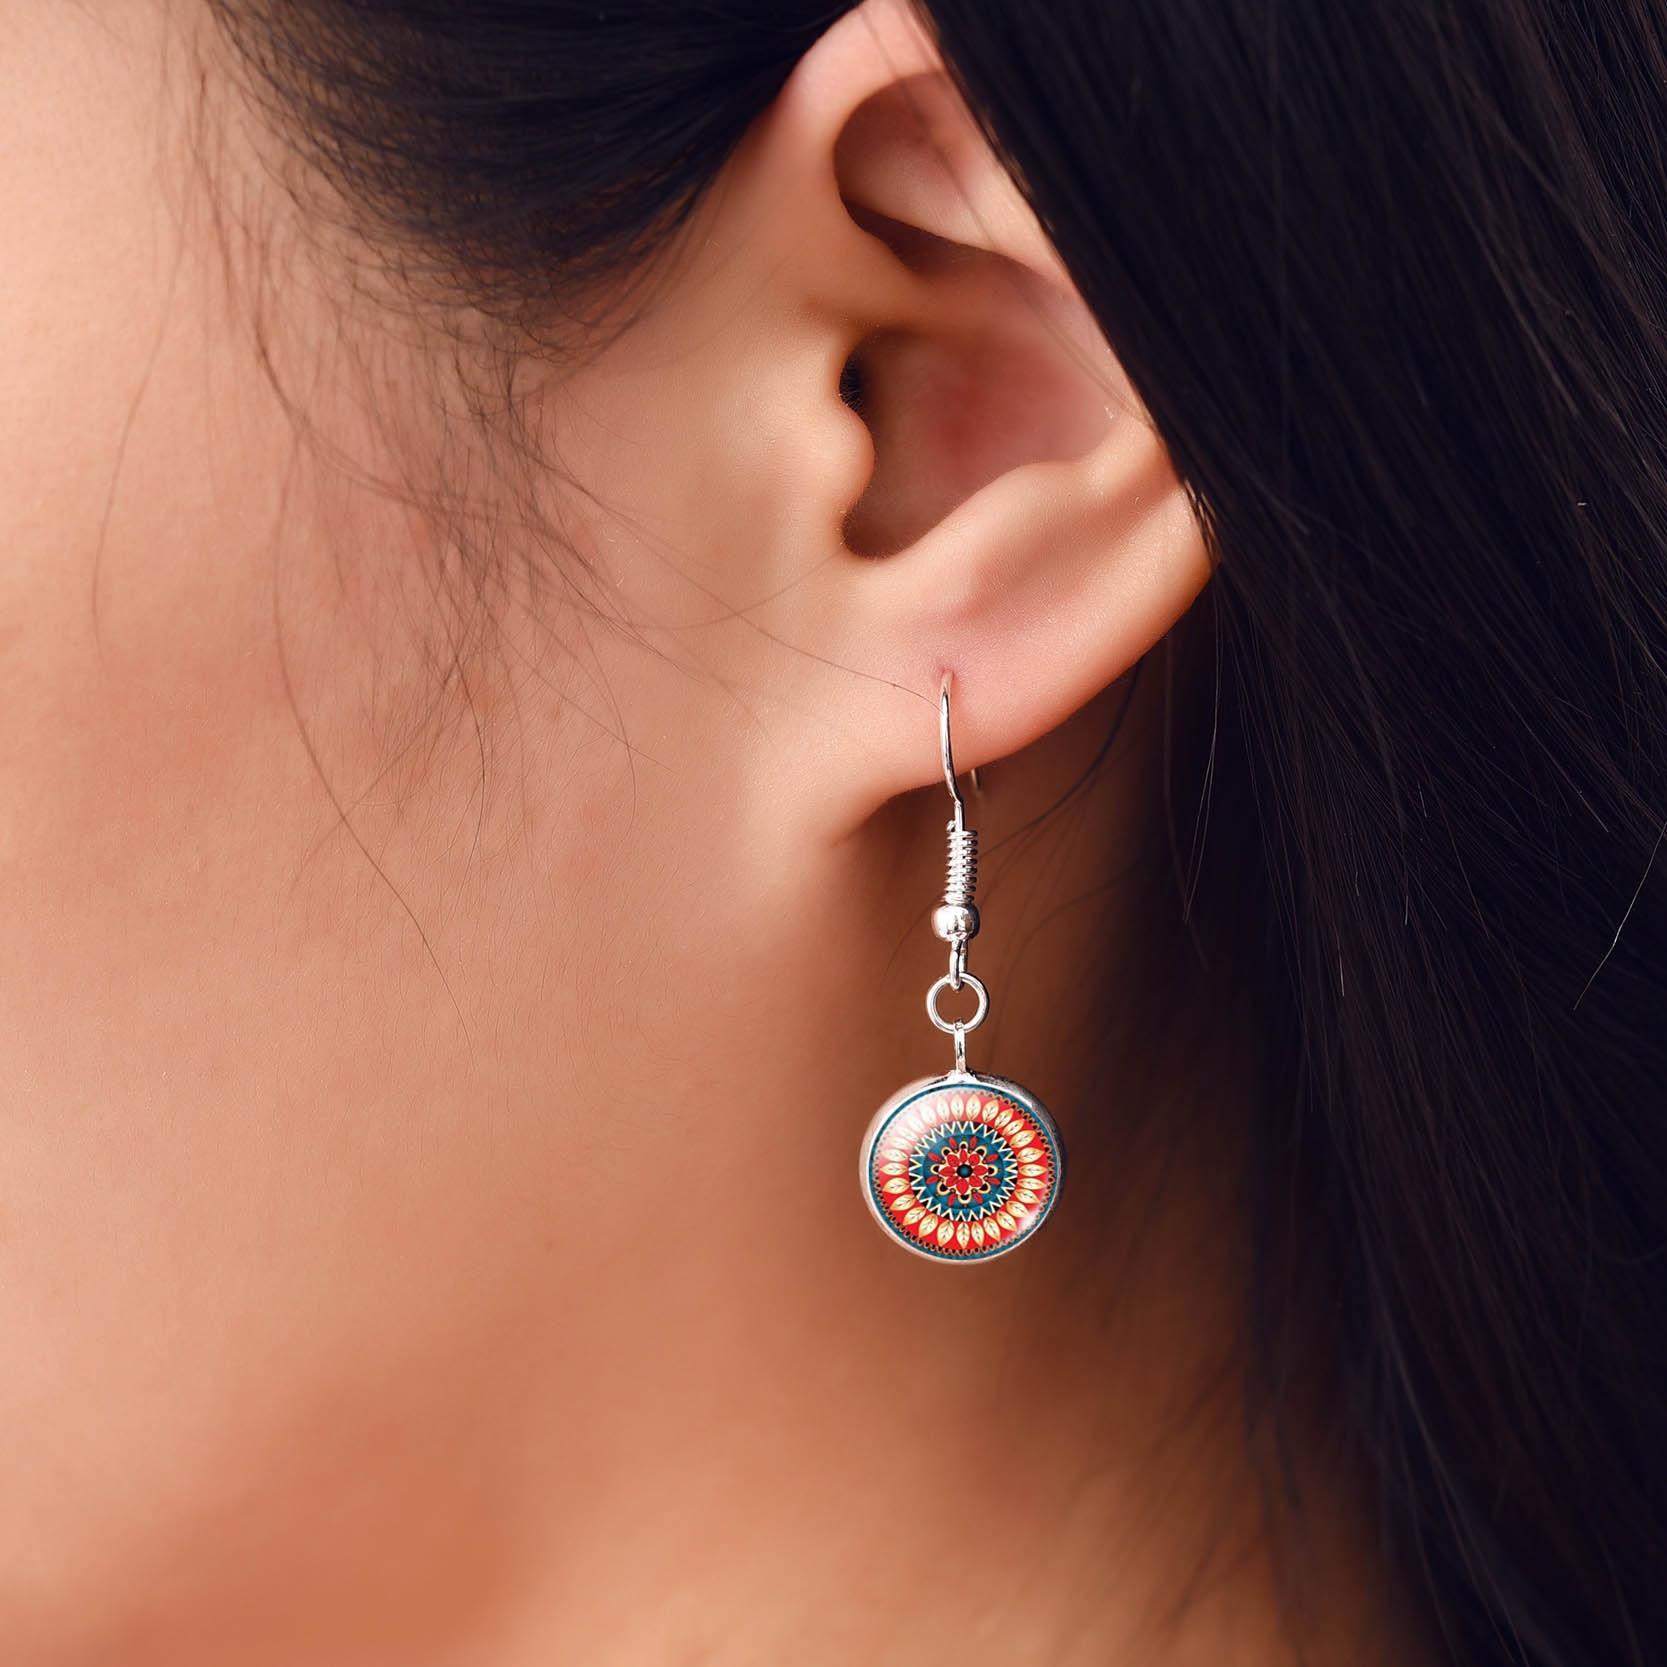 2017 New Fashion Mandala Flower Glass Cabochon Statement Earrings Jewelry For Women Buddhism Mandala Long Drop Earrings Women